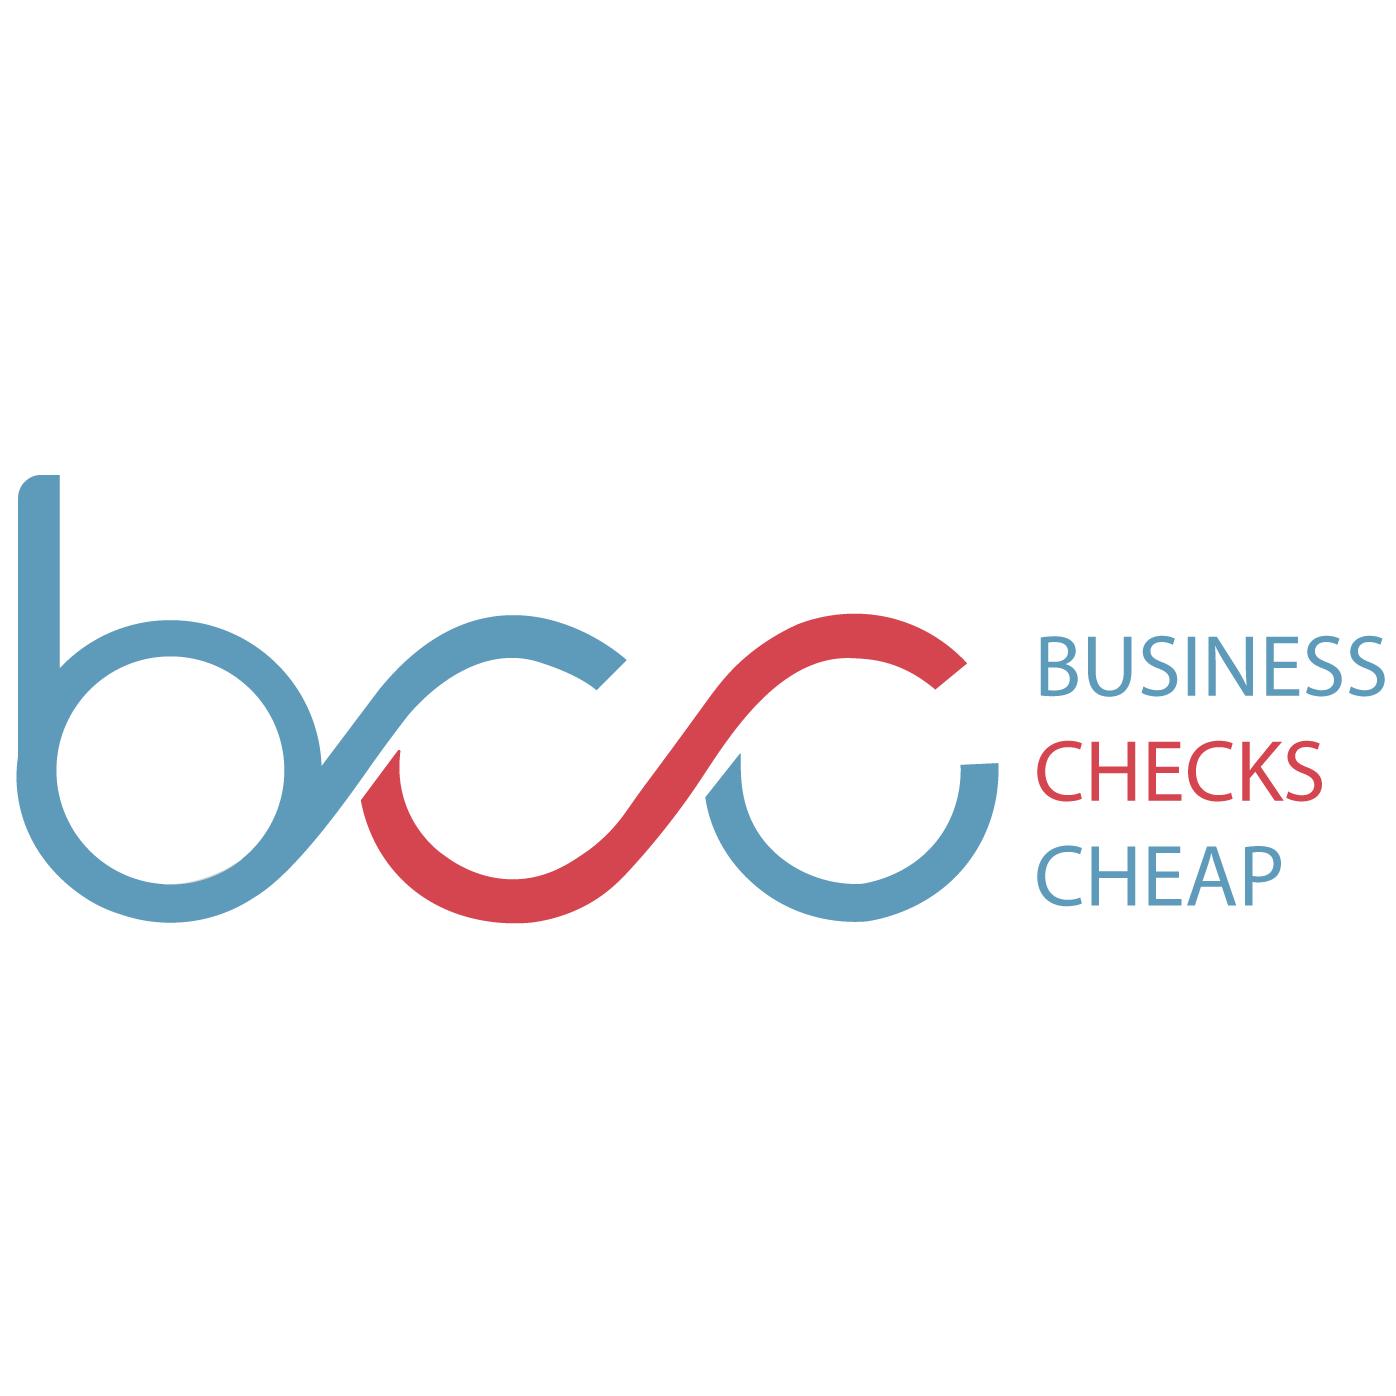 Cheap Business Checks image 5